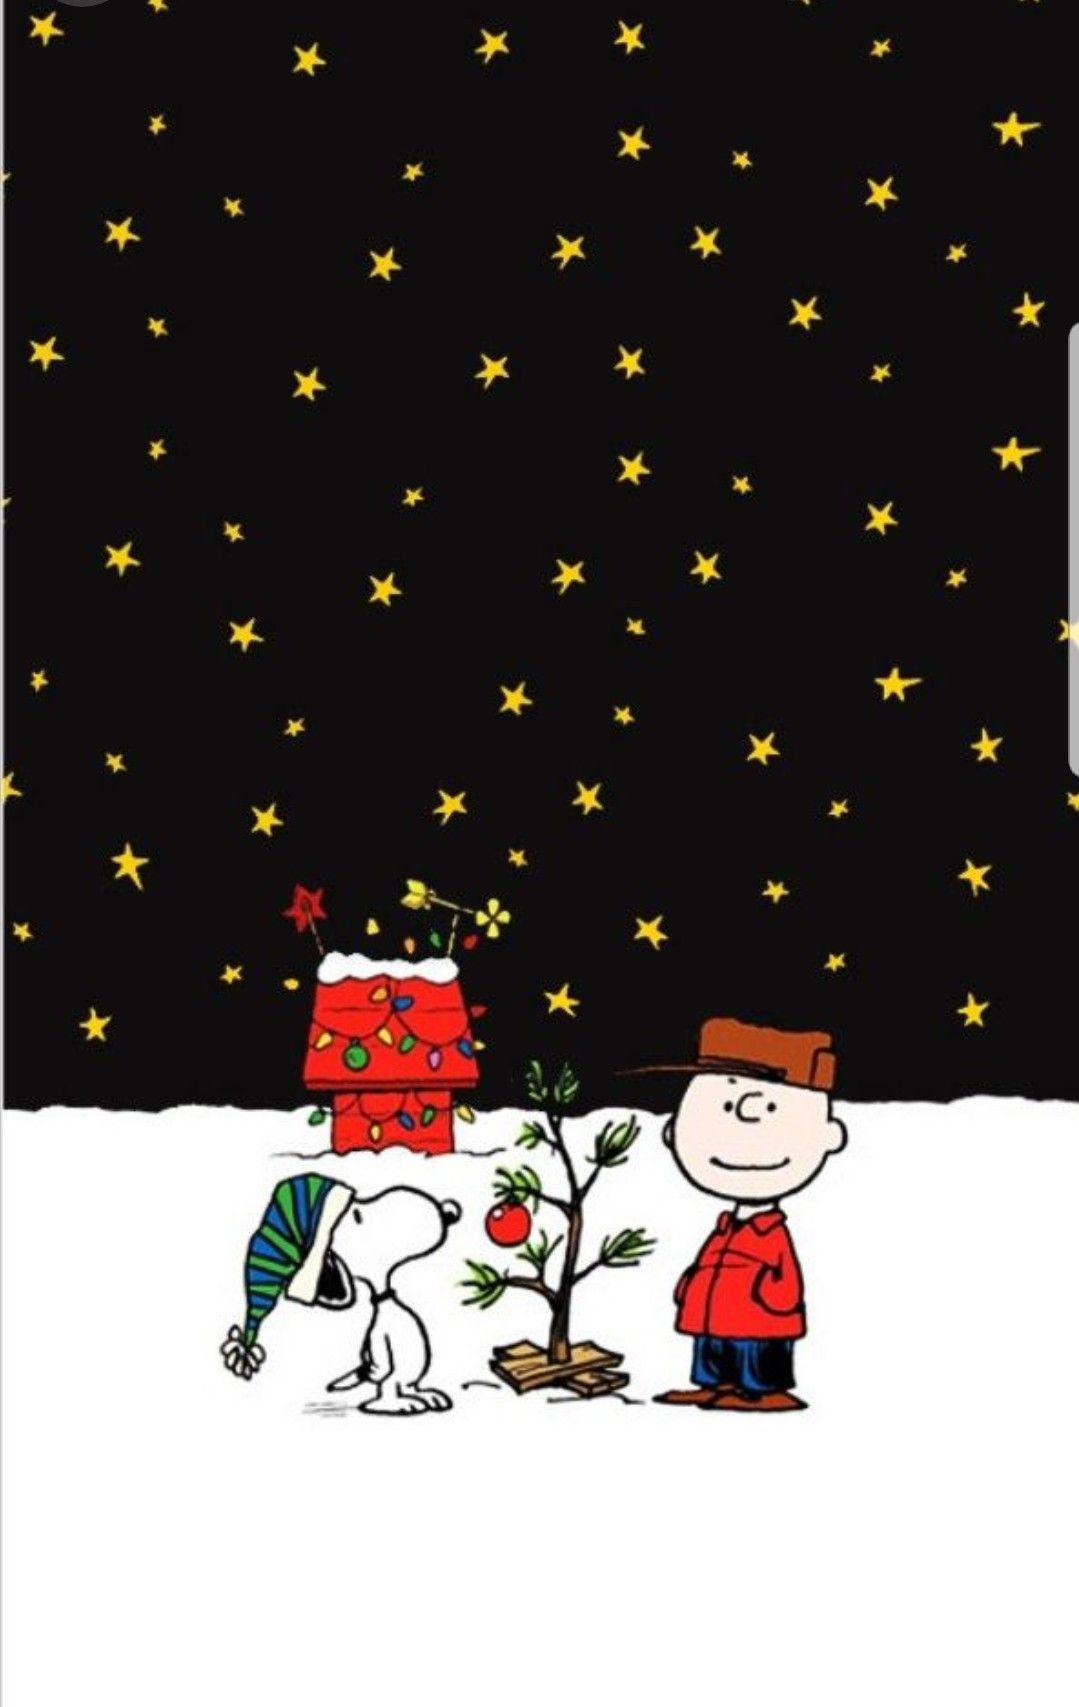 Pin By Samantha On スヌーピー Snoopy Wallpaper Cute Christmas Wallpaper Christmas Phone Wallpaper